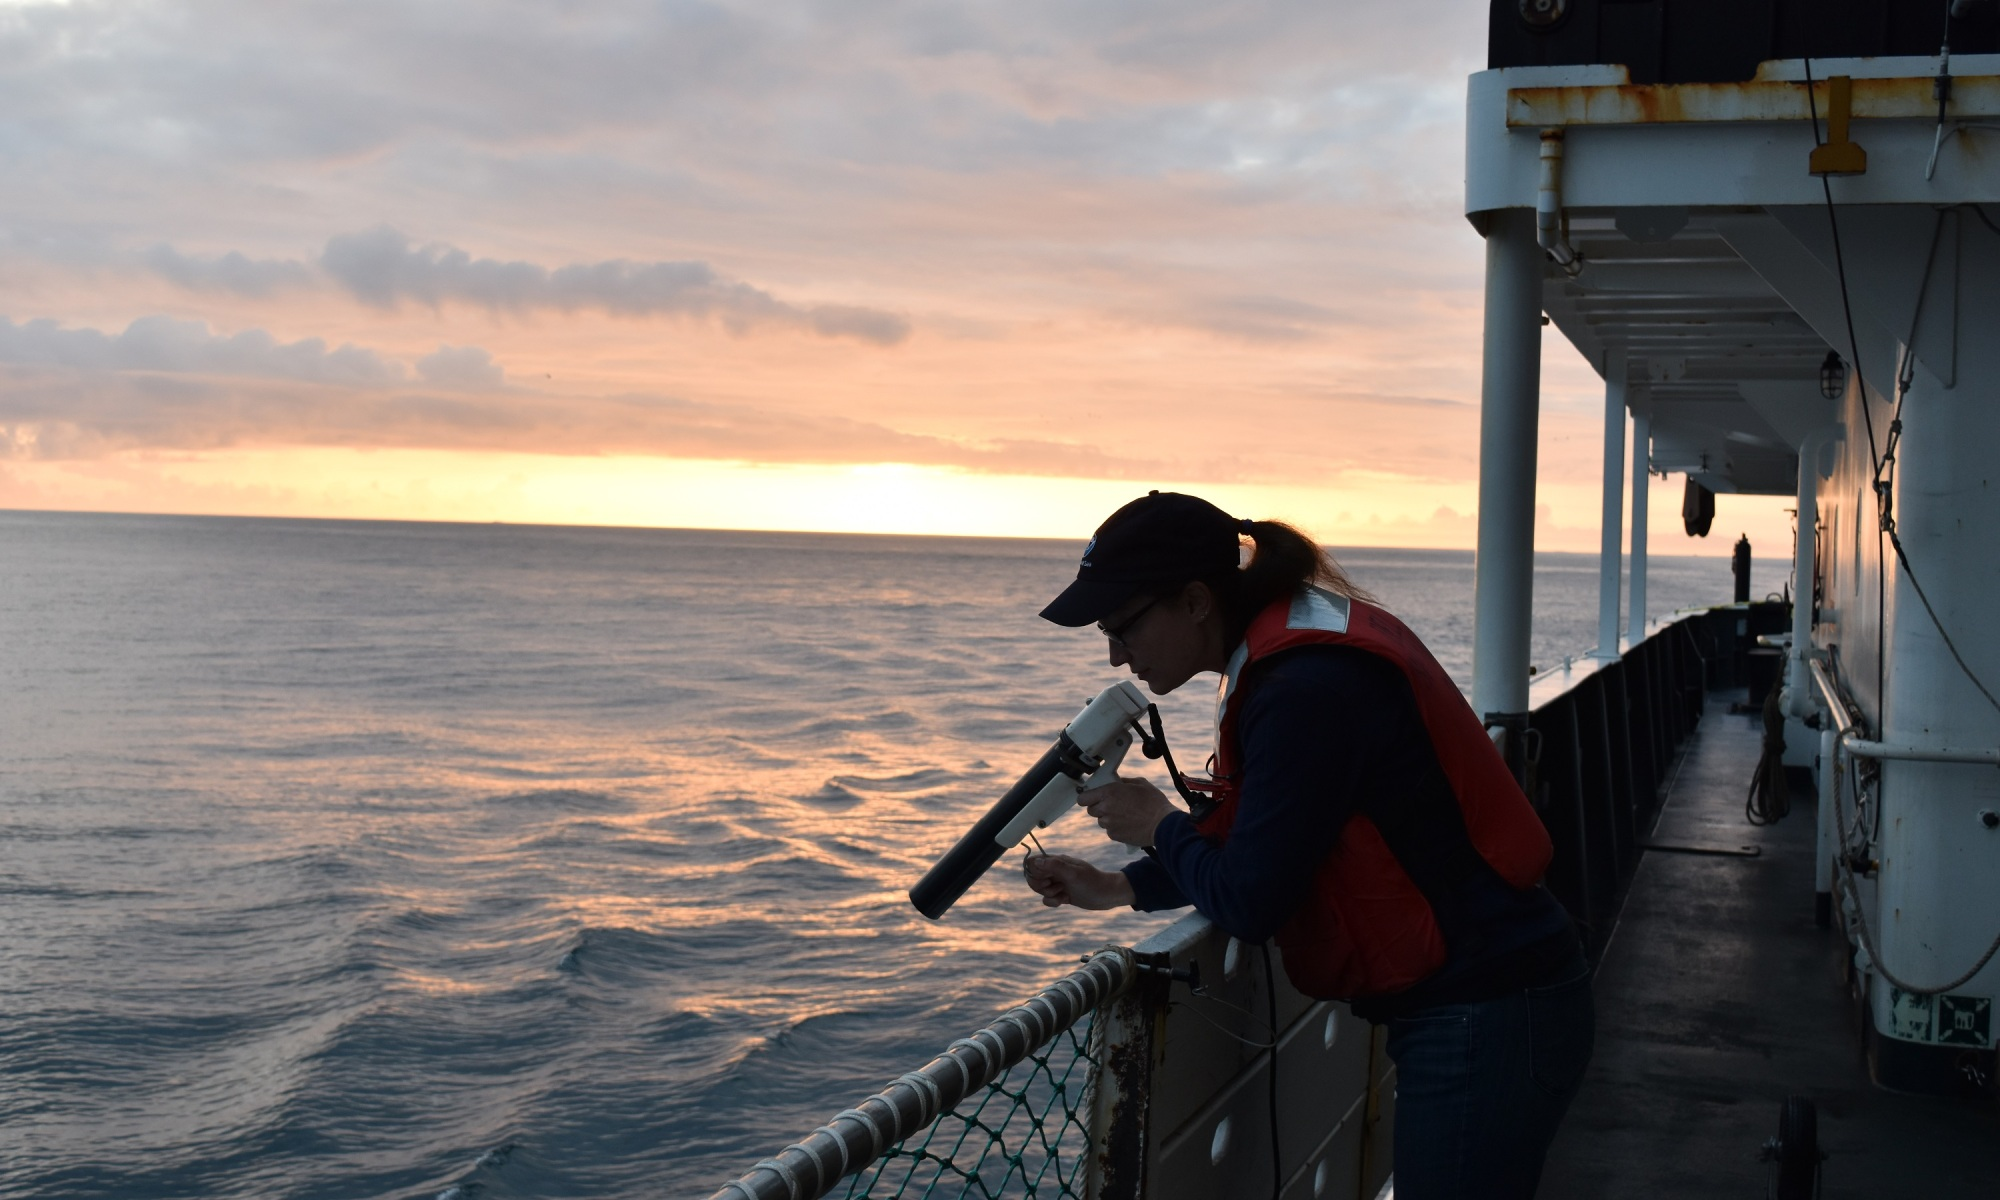 Sunset XBT deployment off Shimada